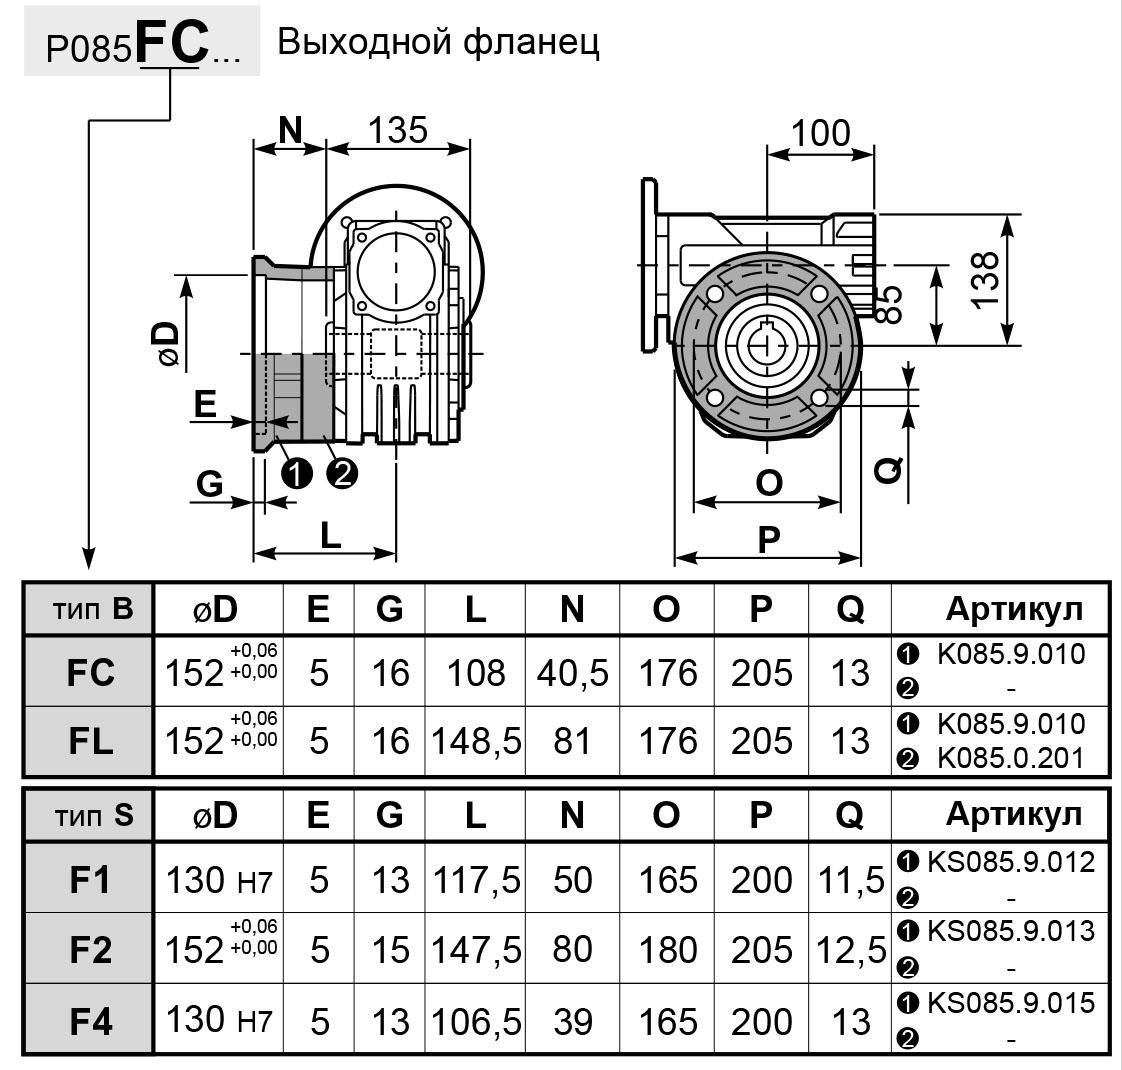 Чертеж редуктора P 085 hydro-mec фланцы